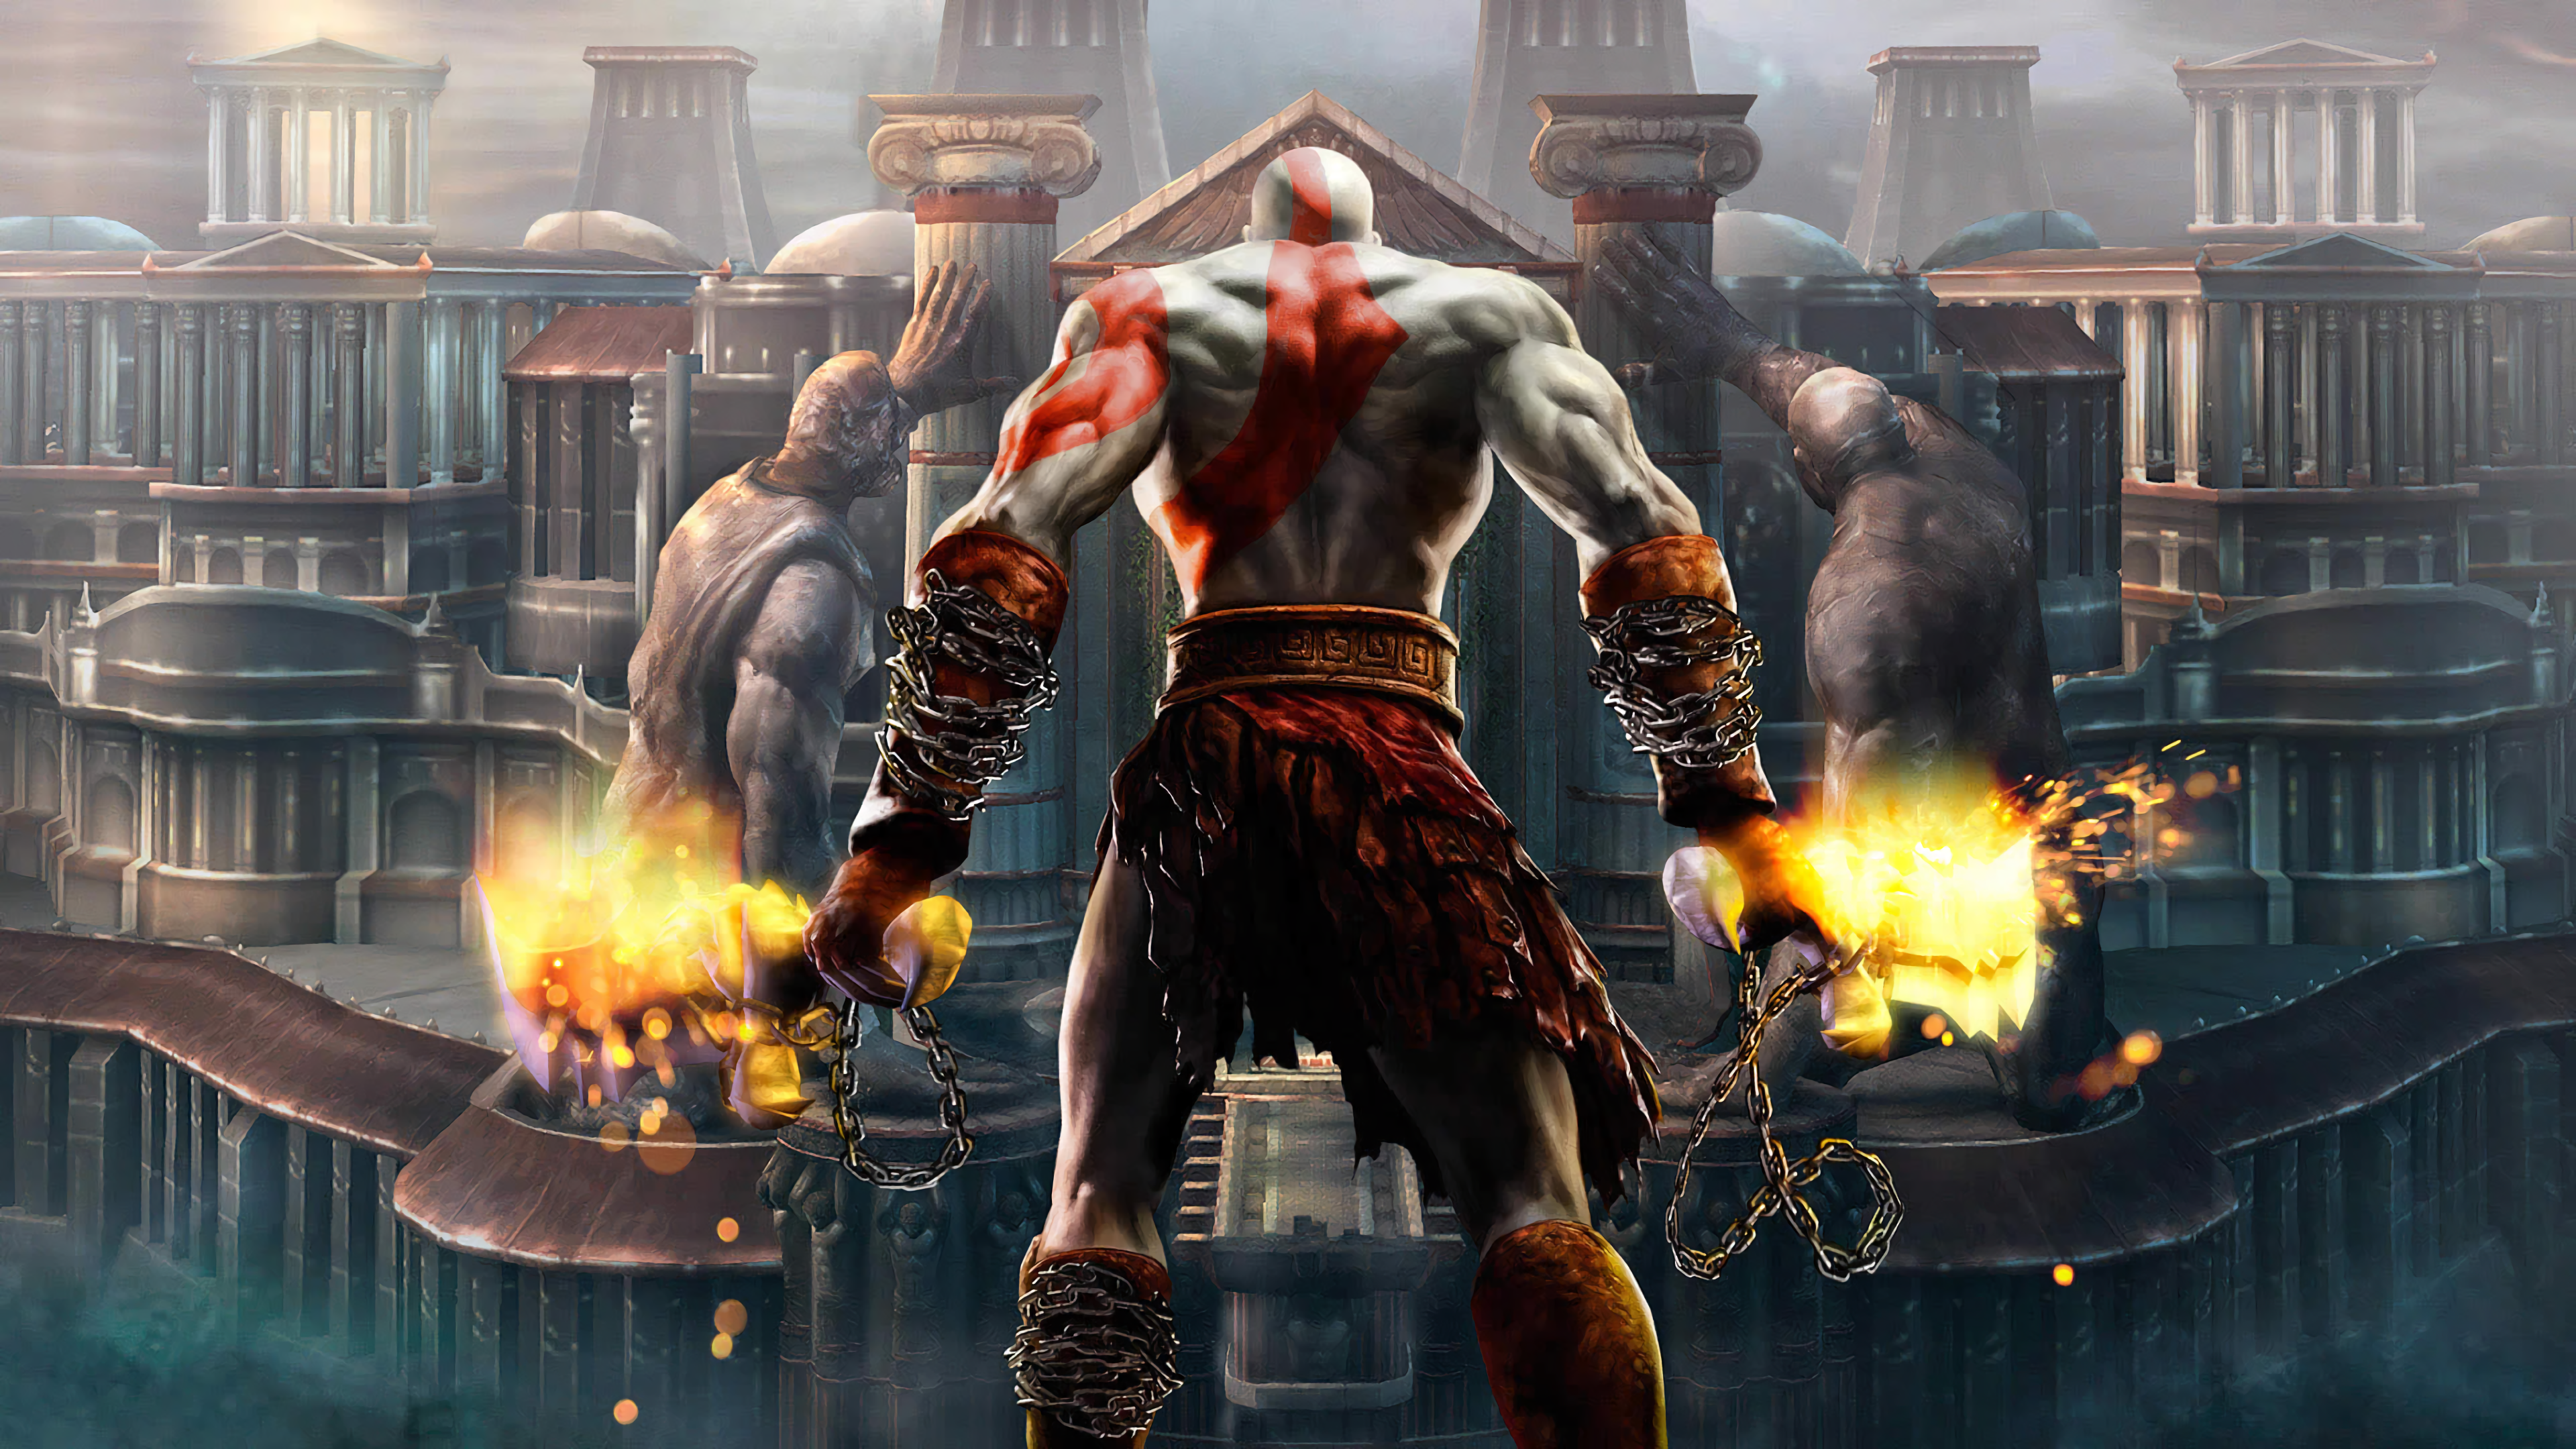 General 3840x2160 Kratos God of War video games mythology God of War II Sony Computer Entertainment video game man video game art fantasy art